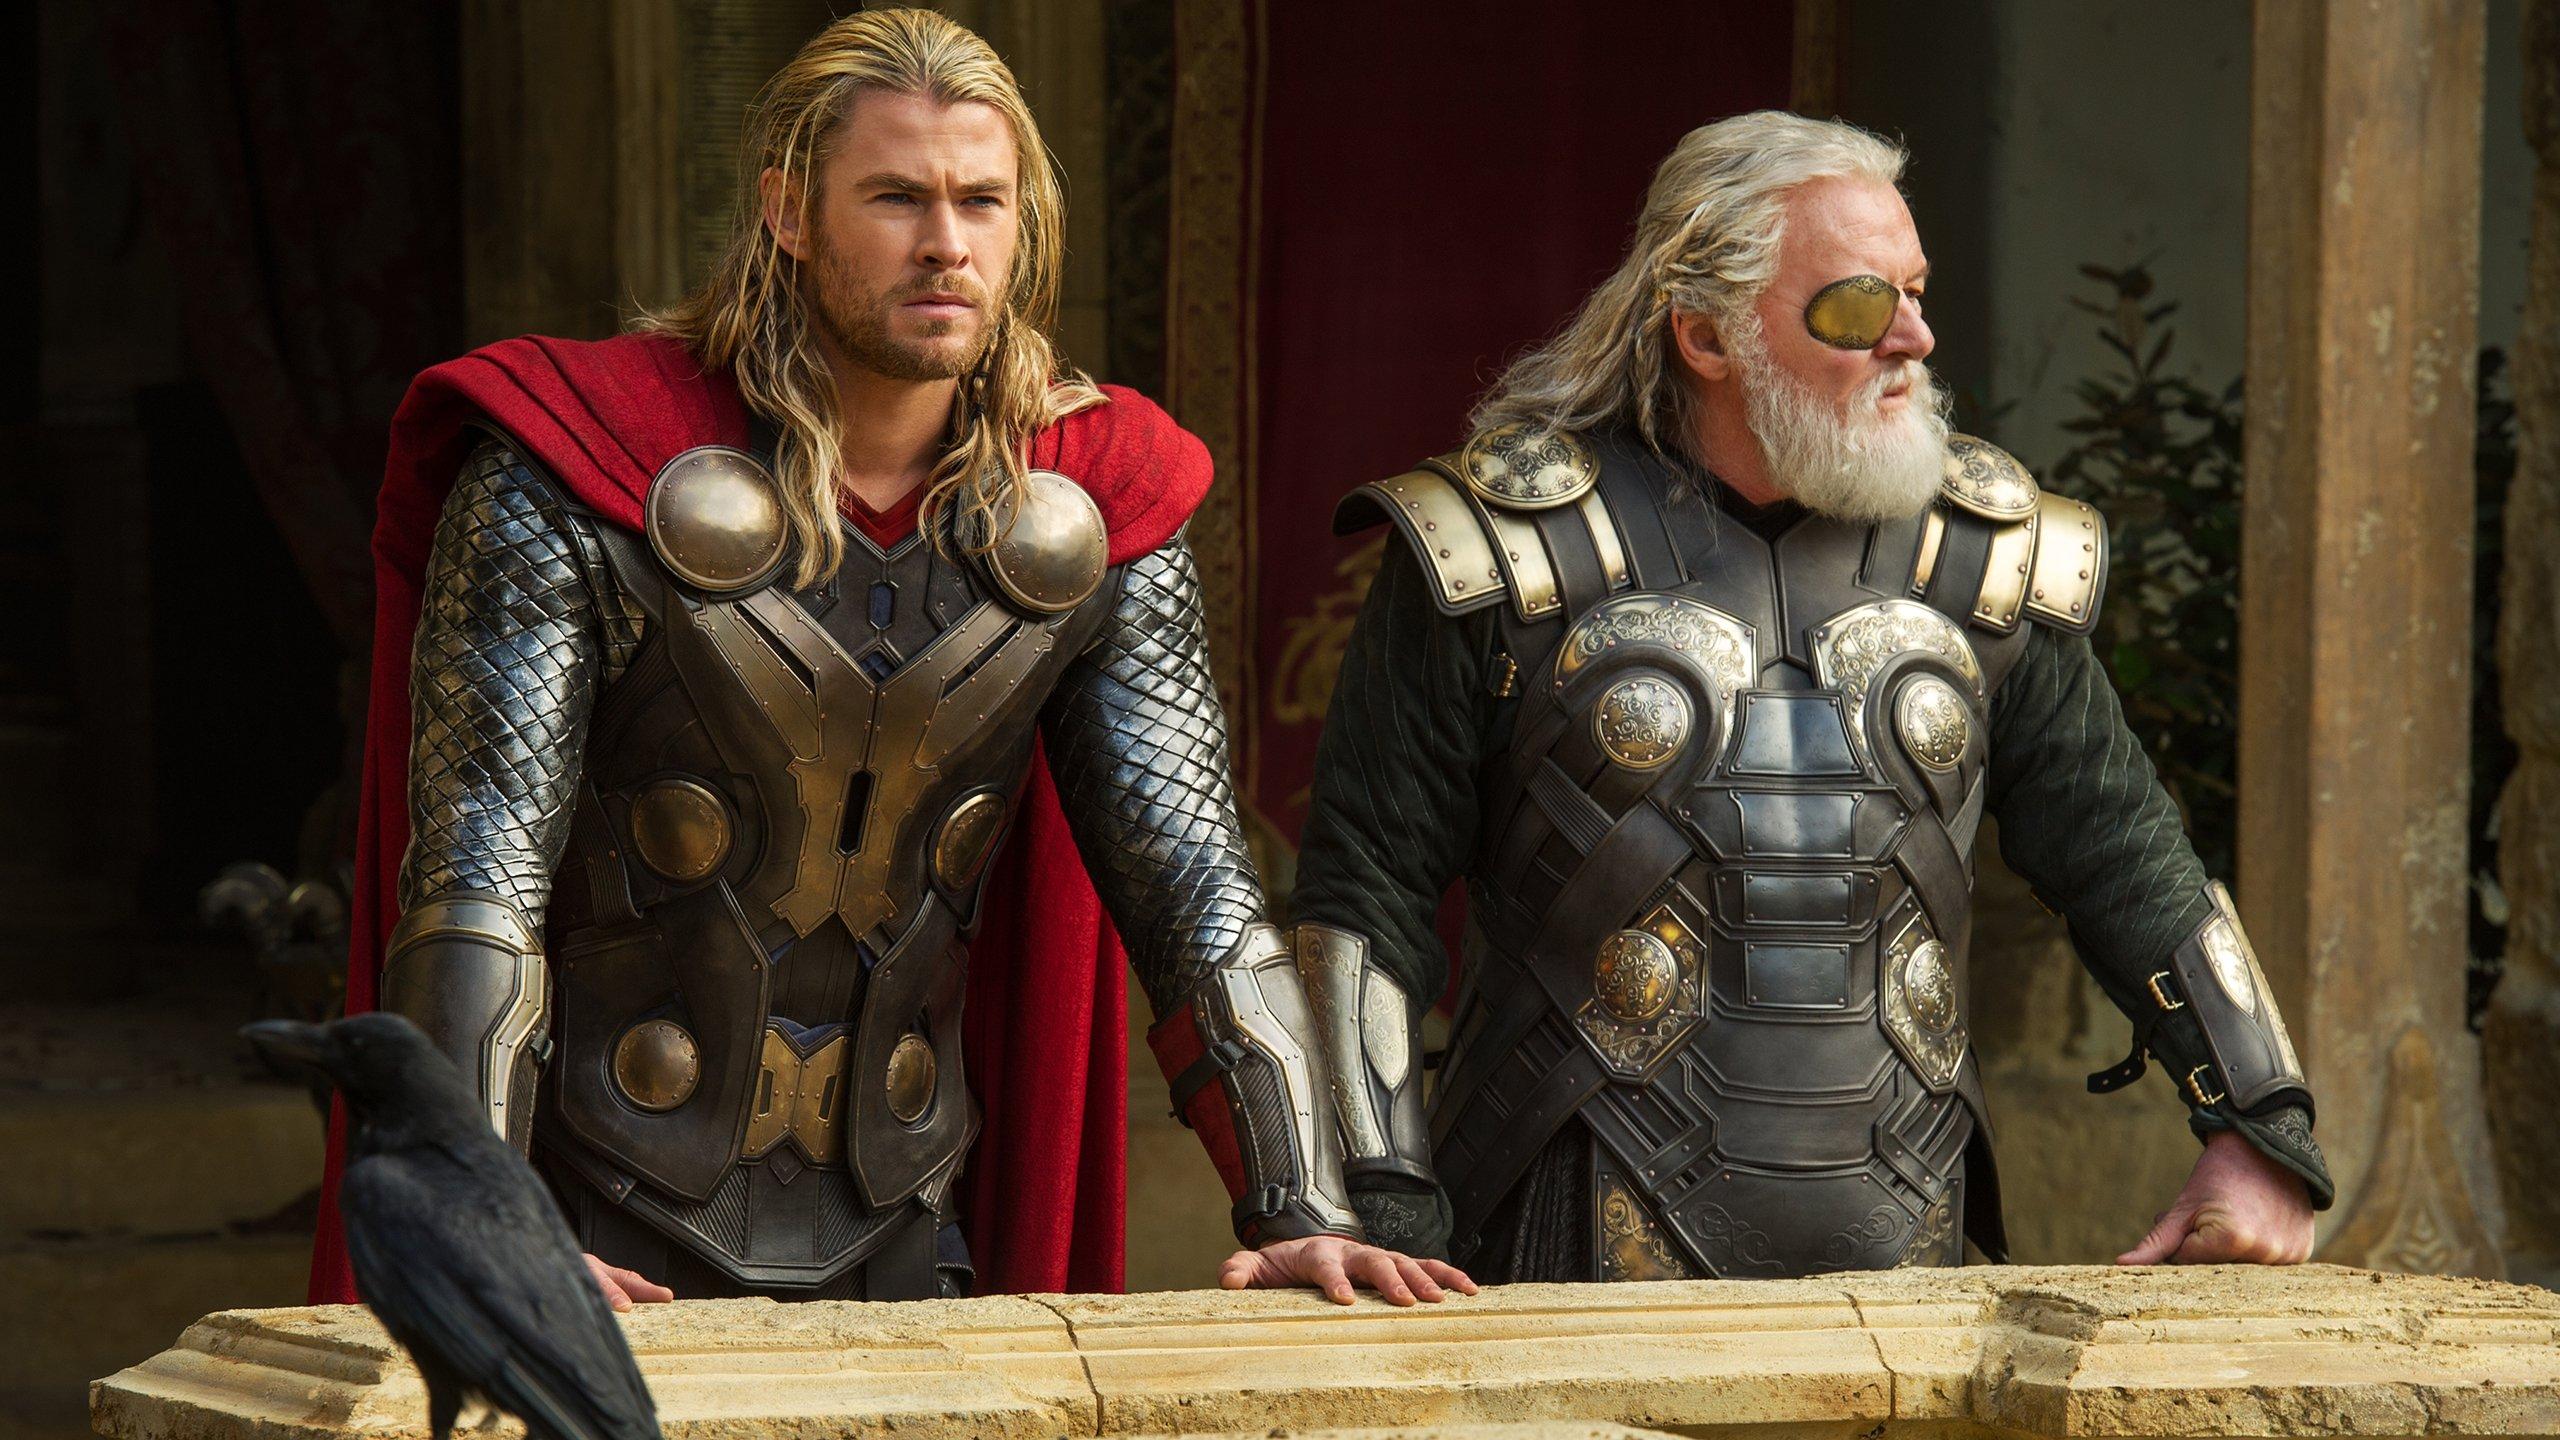 Thor The Dark World 10436 Hd Wallpaper